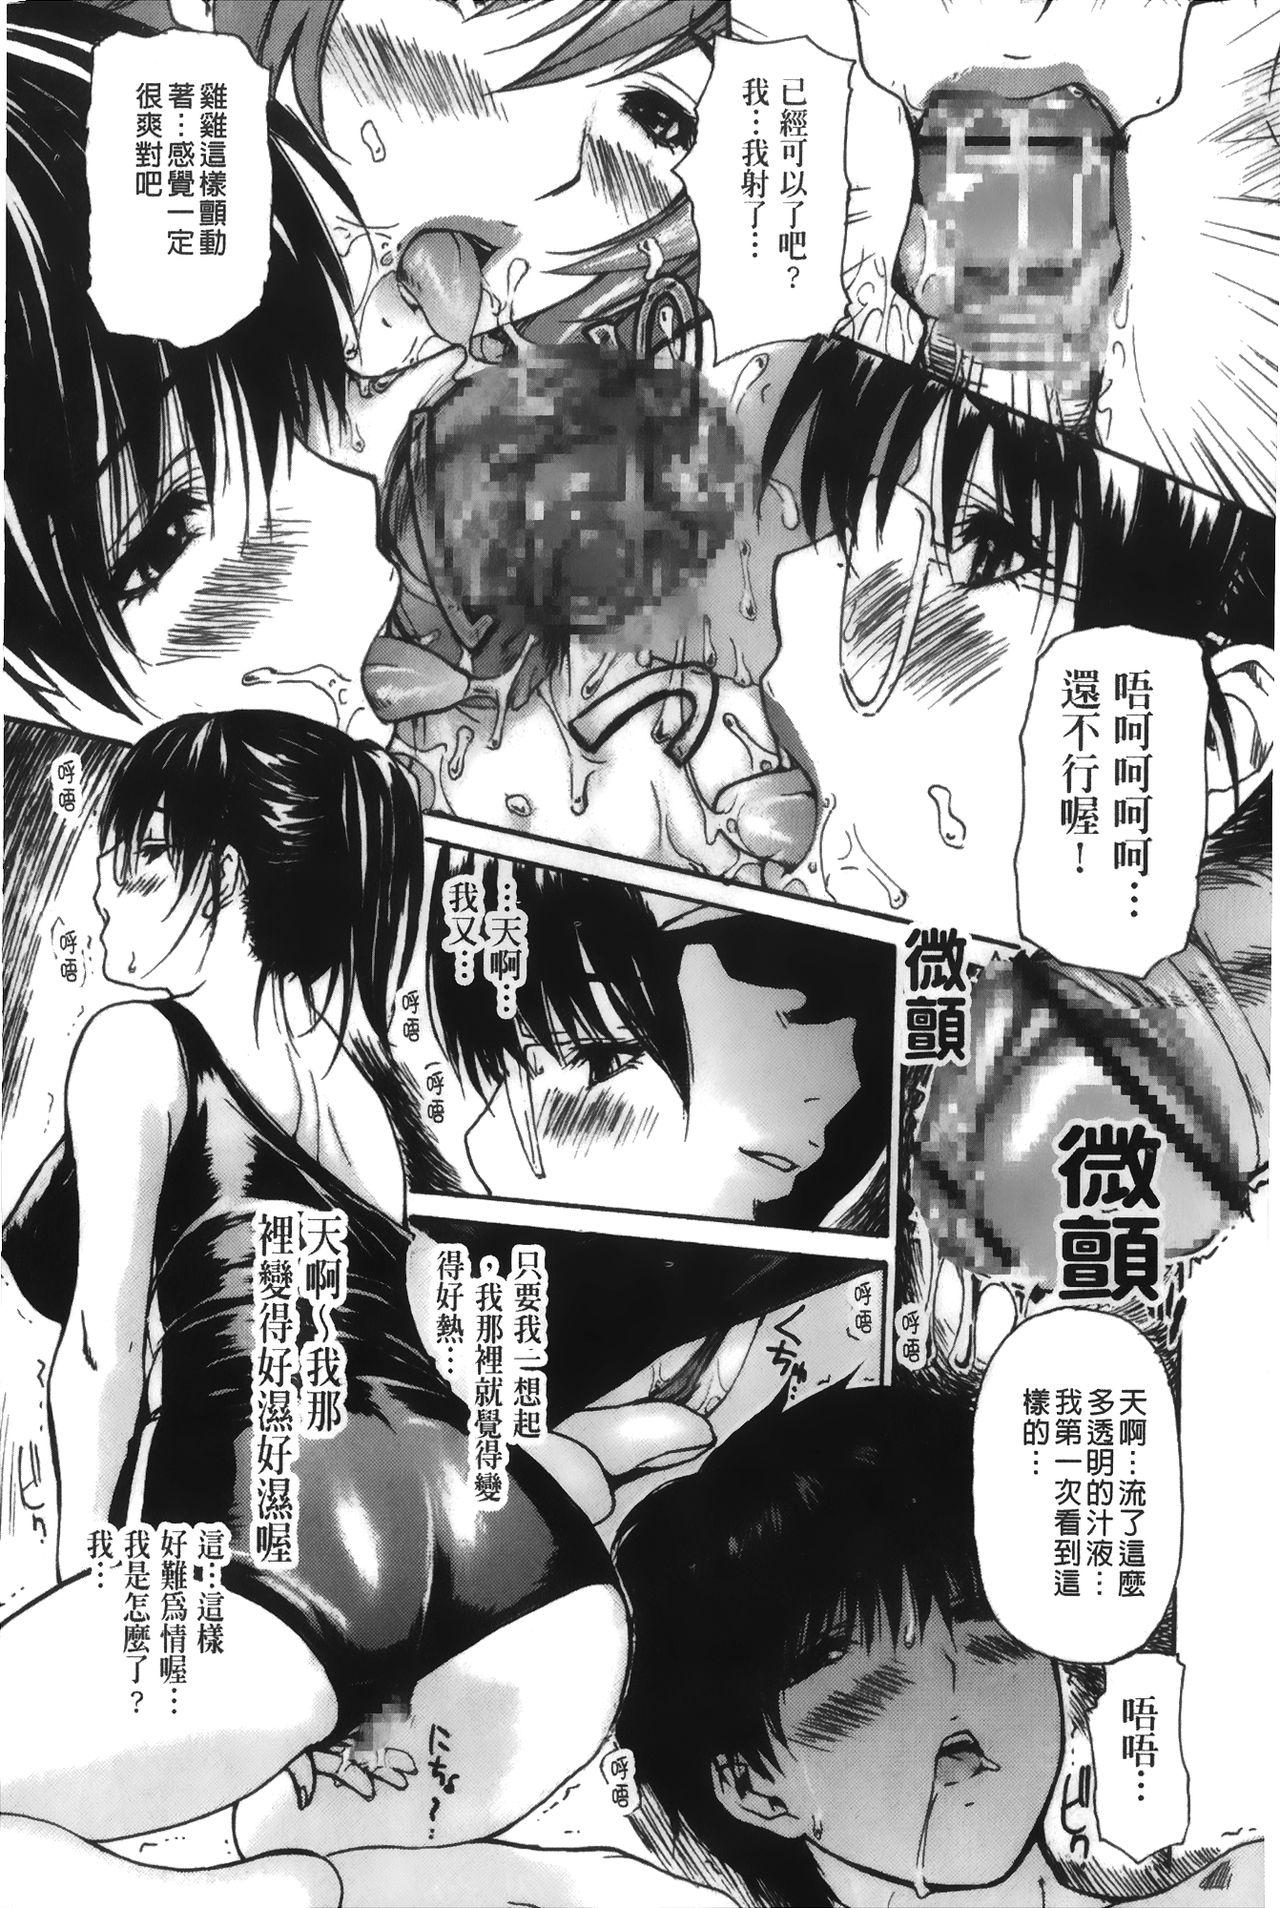 Tonari no Minano Sensei 4 | 隔壁的美奈乃老師 4 26